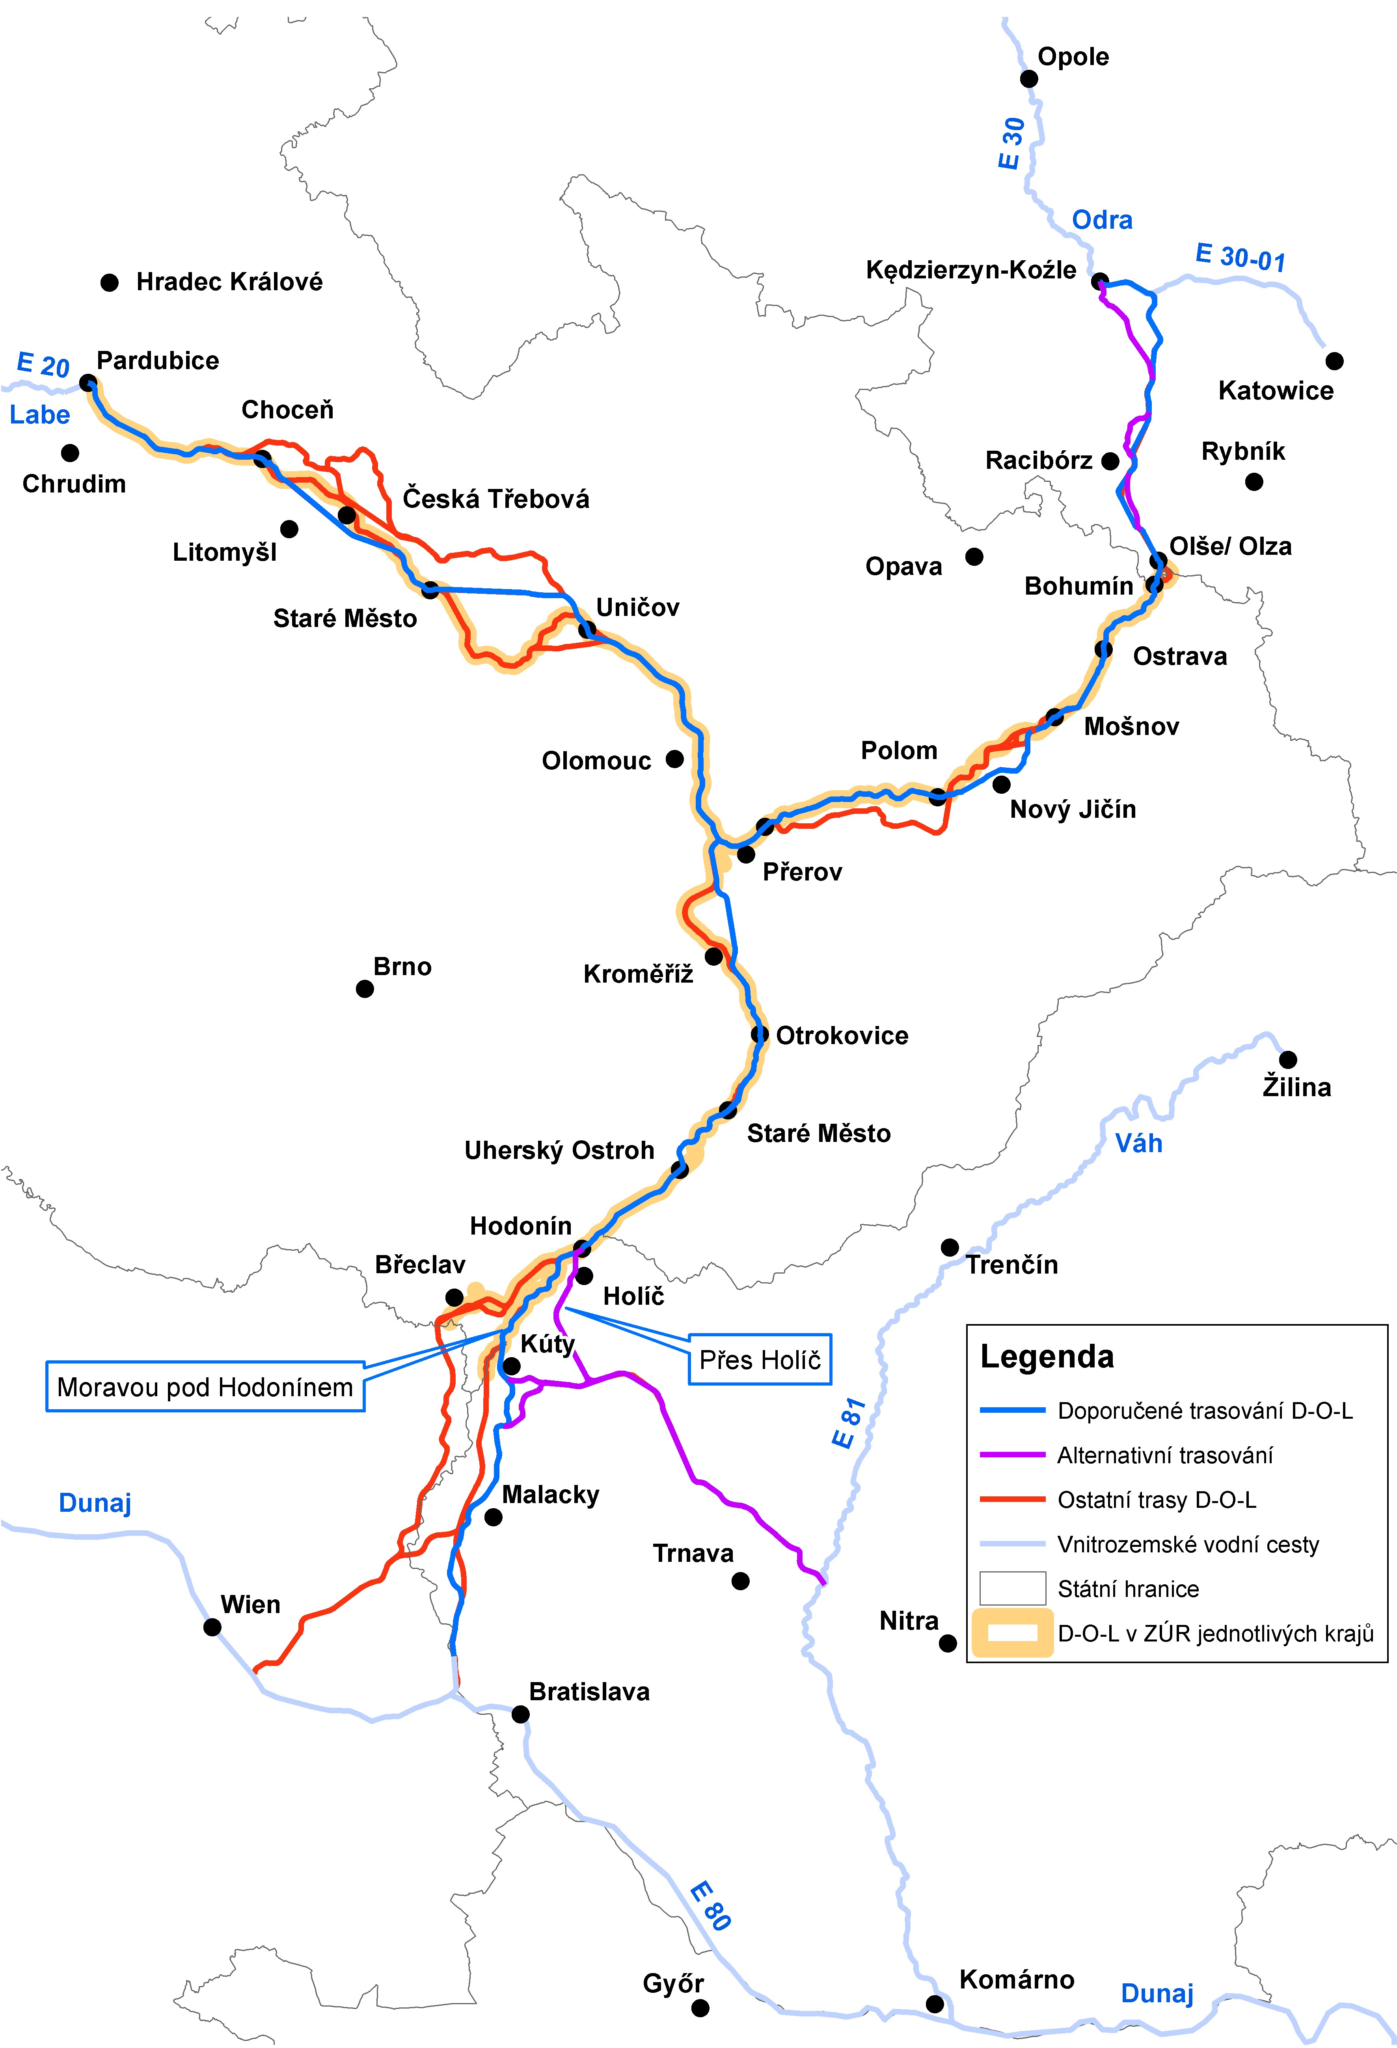 Kanal Oder-Donau